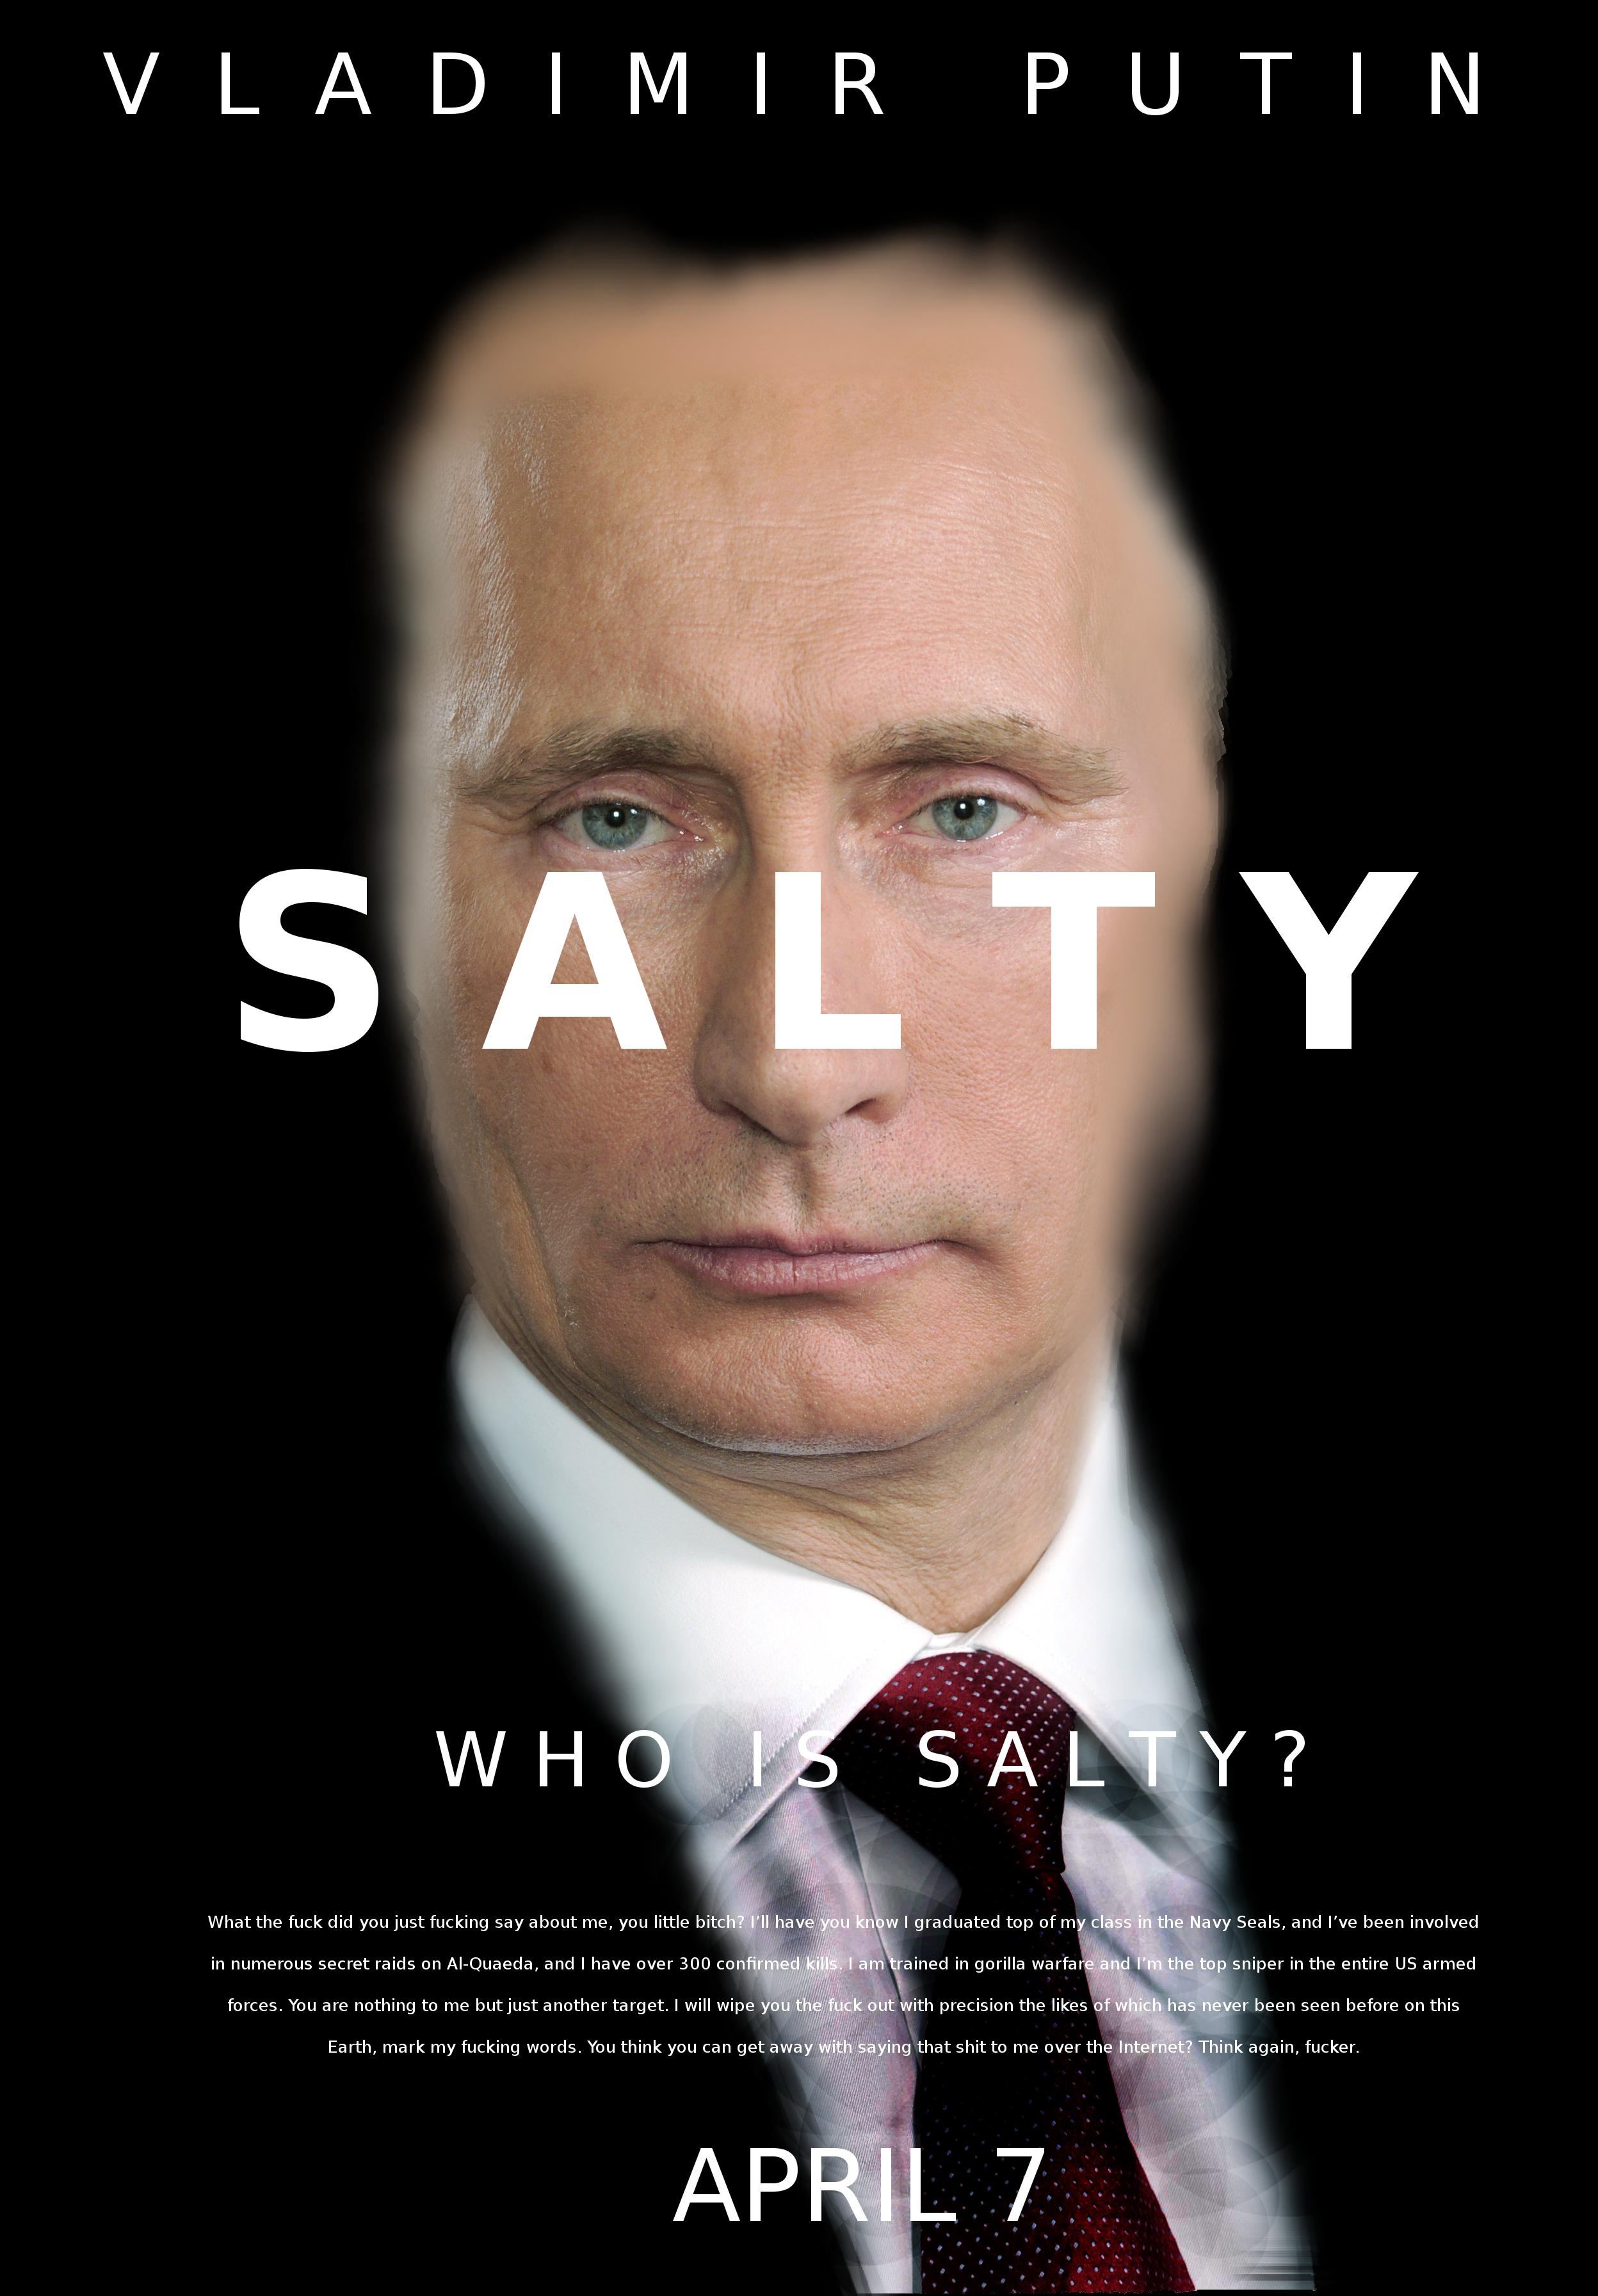 75d who is salty? russian anti meme law know your meme,Meme Law